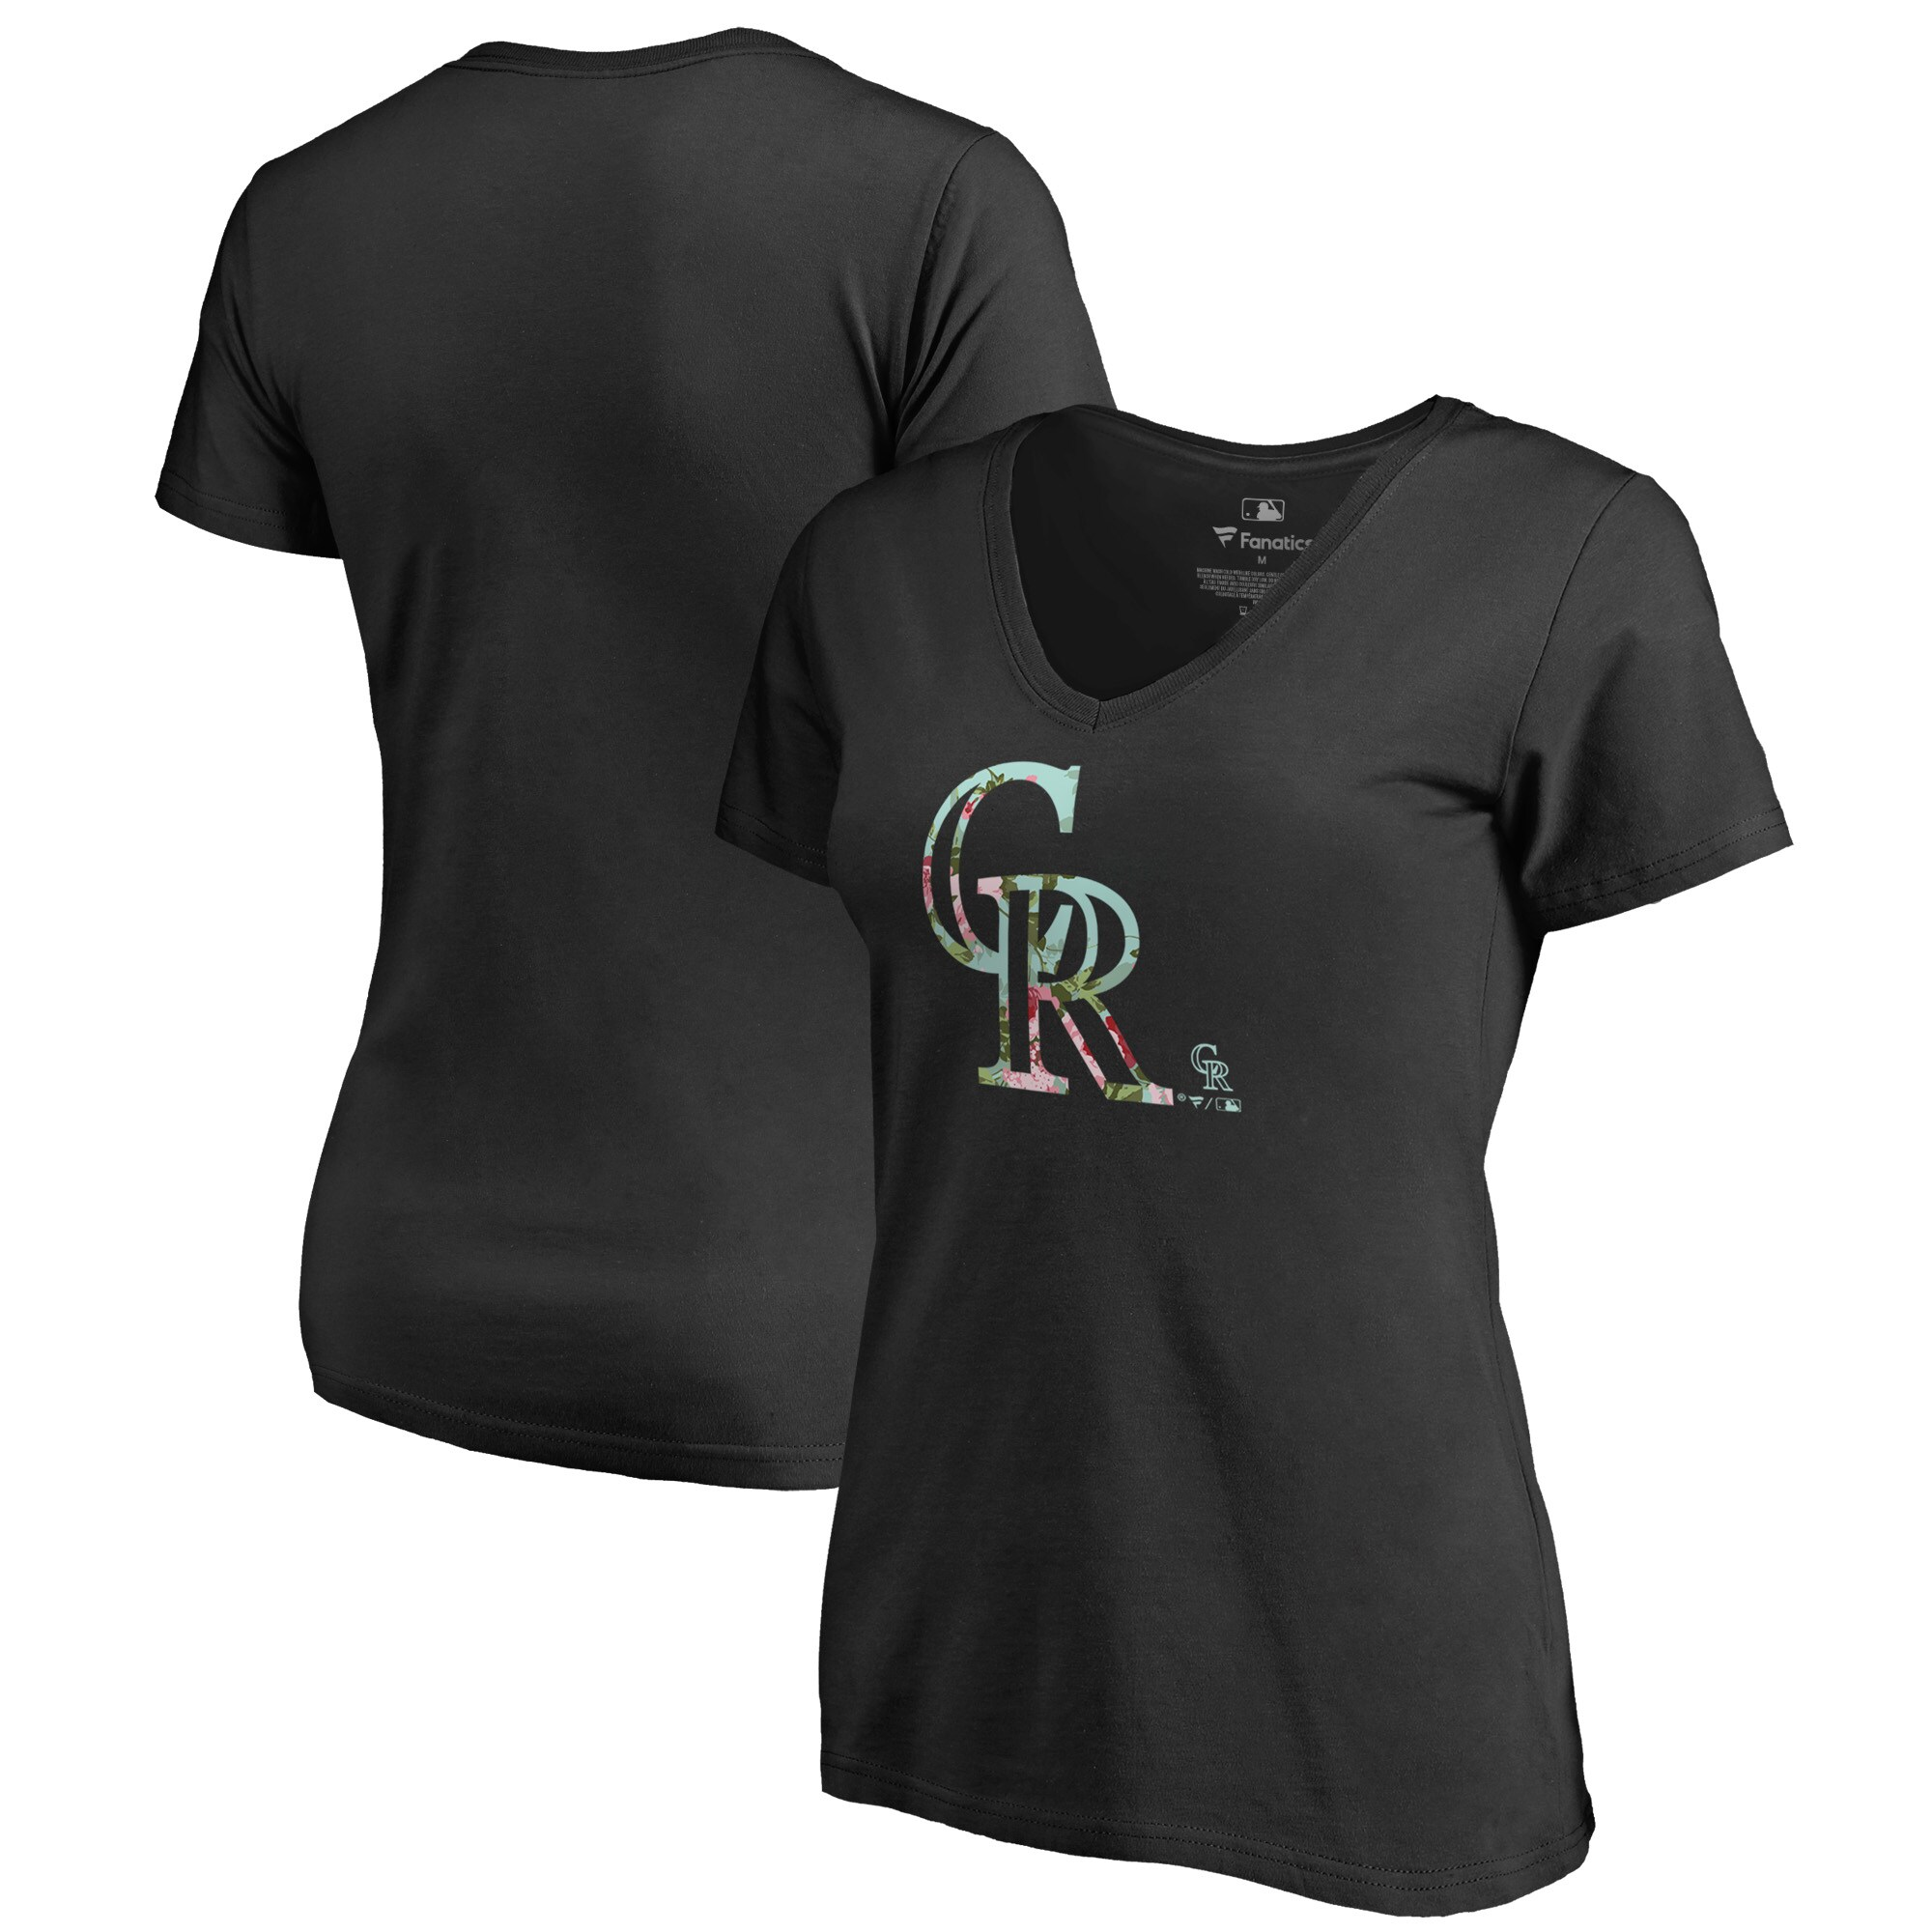 Colorado Rockies Fanatics Branded Women's Lovely V-Neck T-Shirt - Black